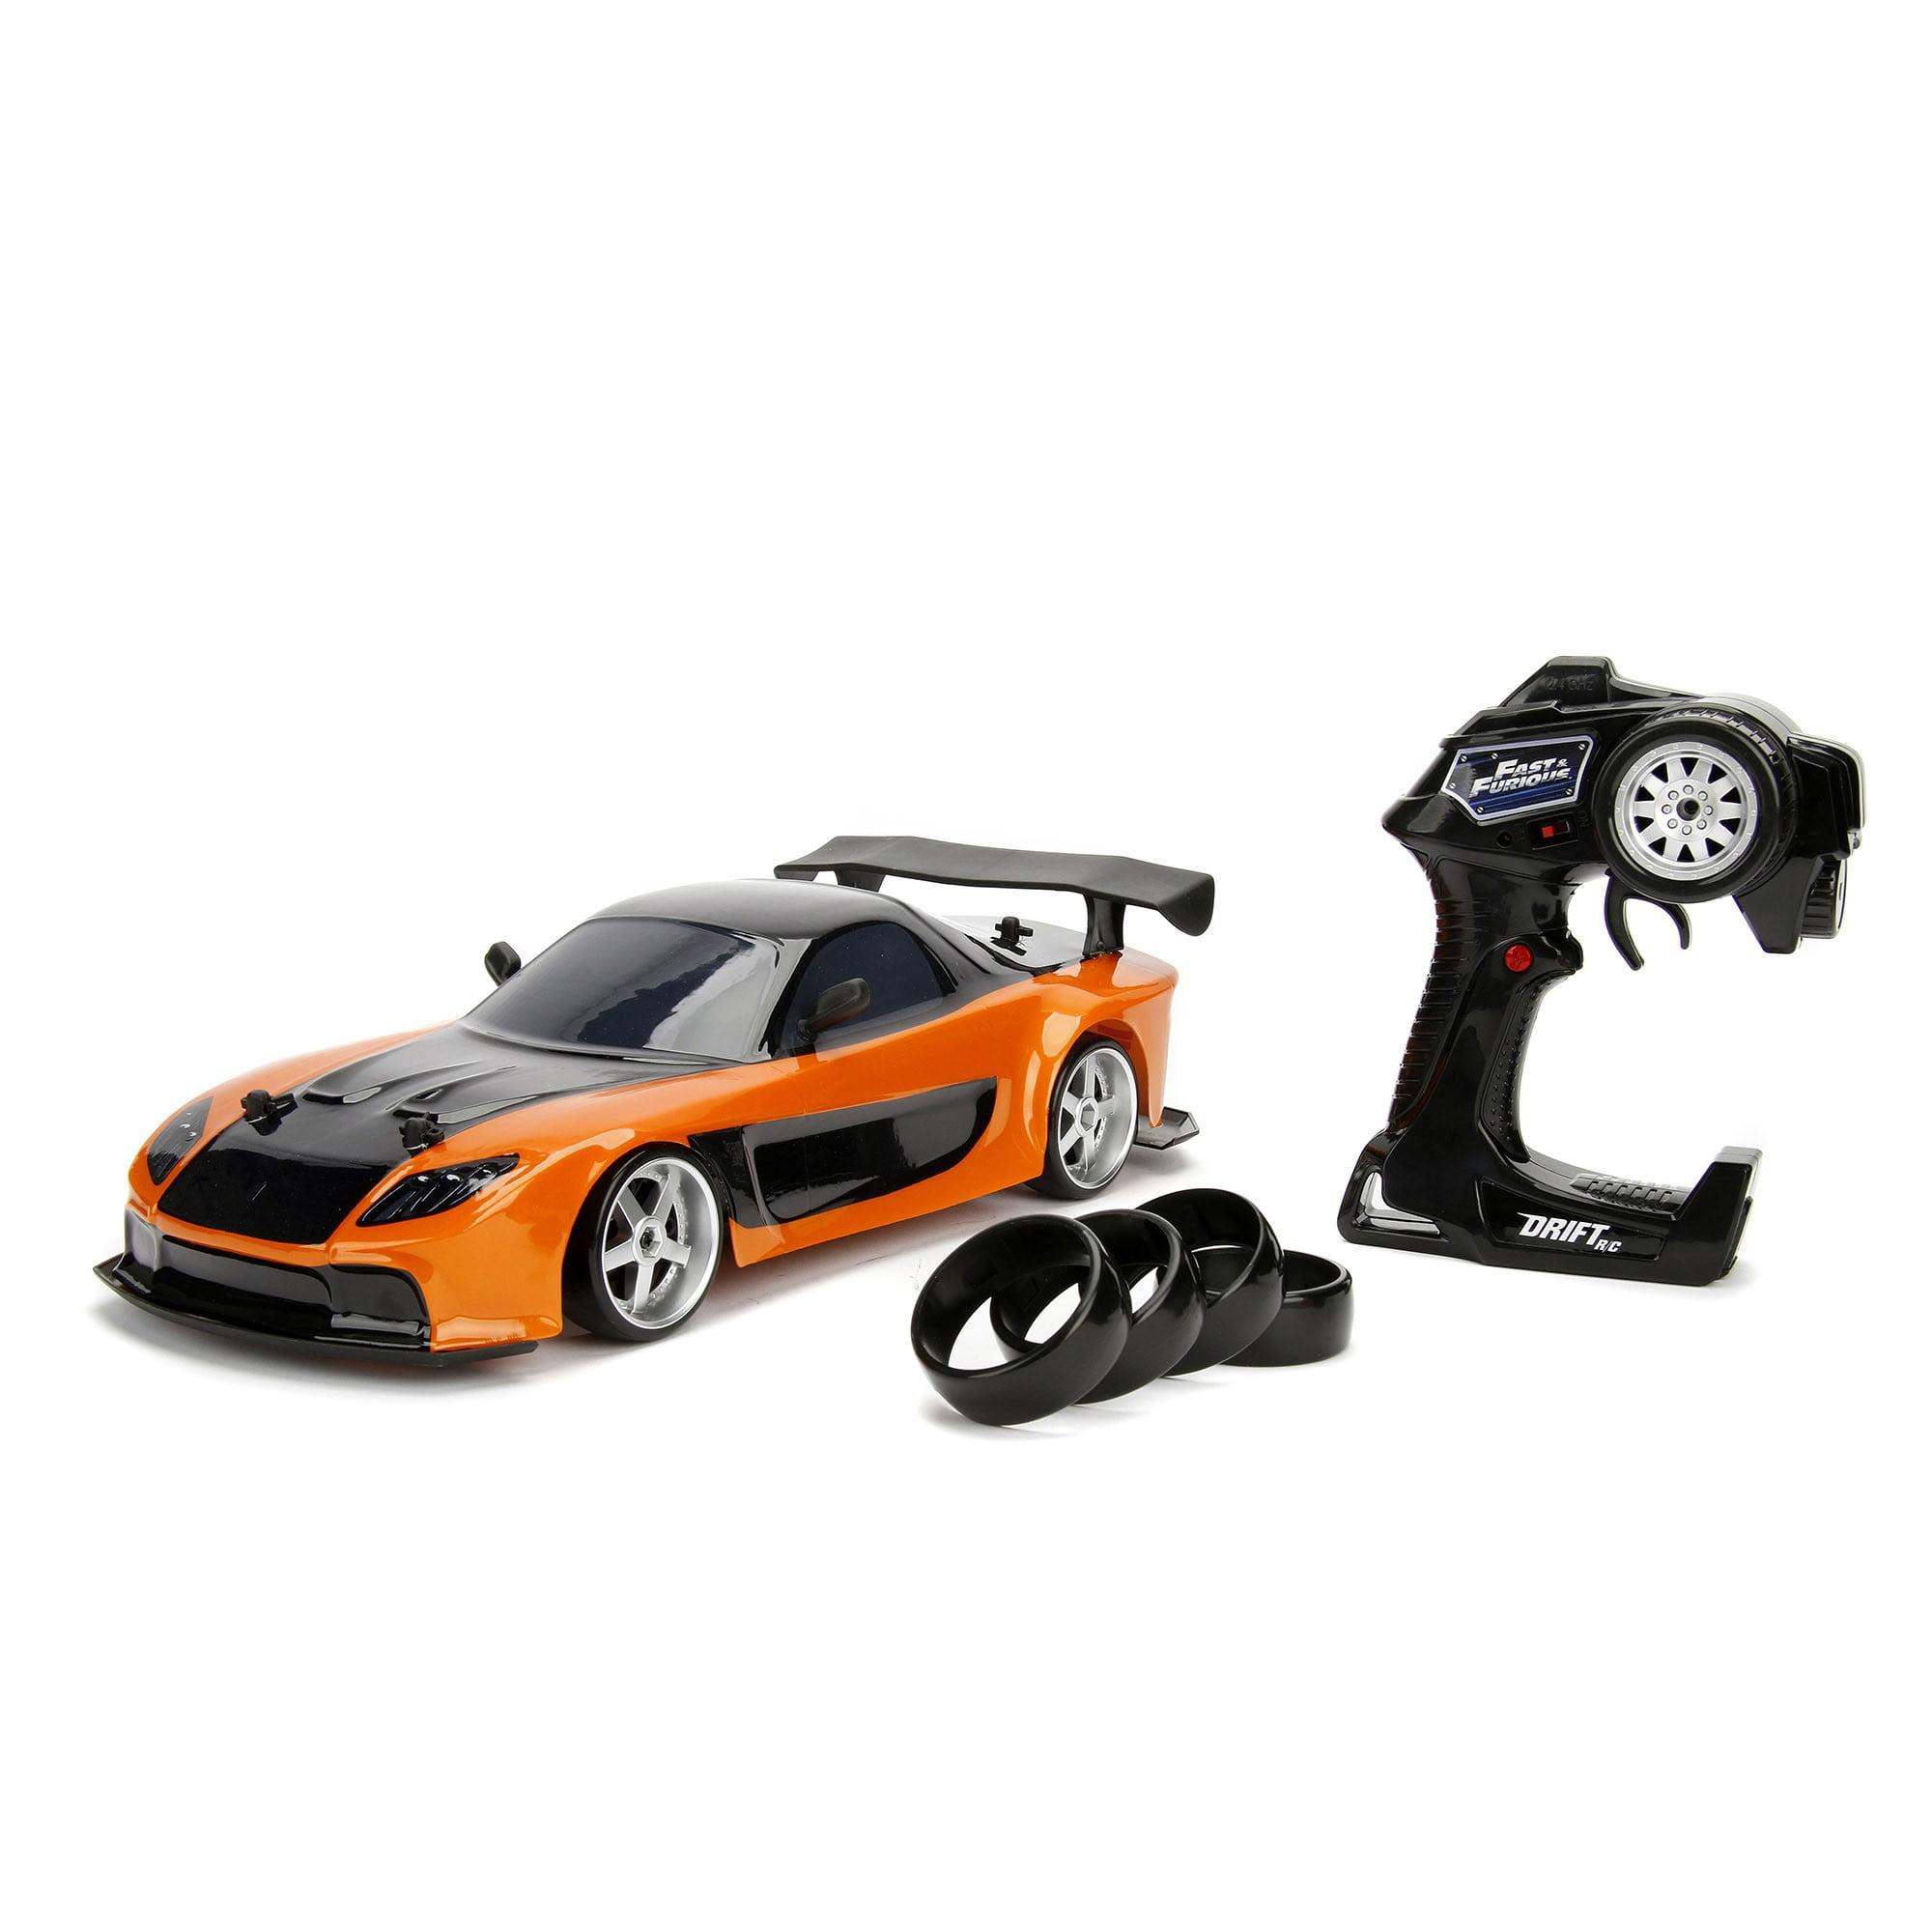 Jada Toys Fast And Furious 1 10 Drift R C Mazda Rx 7 Walmart Com Walmart Com